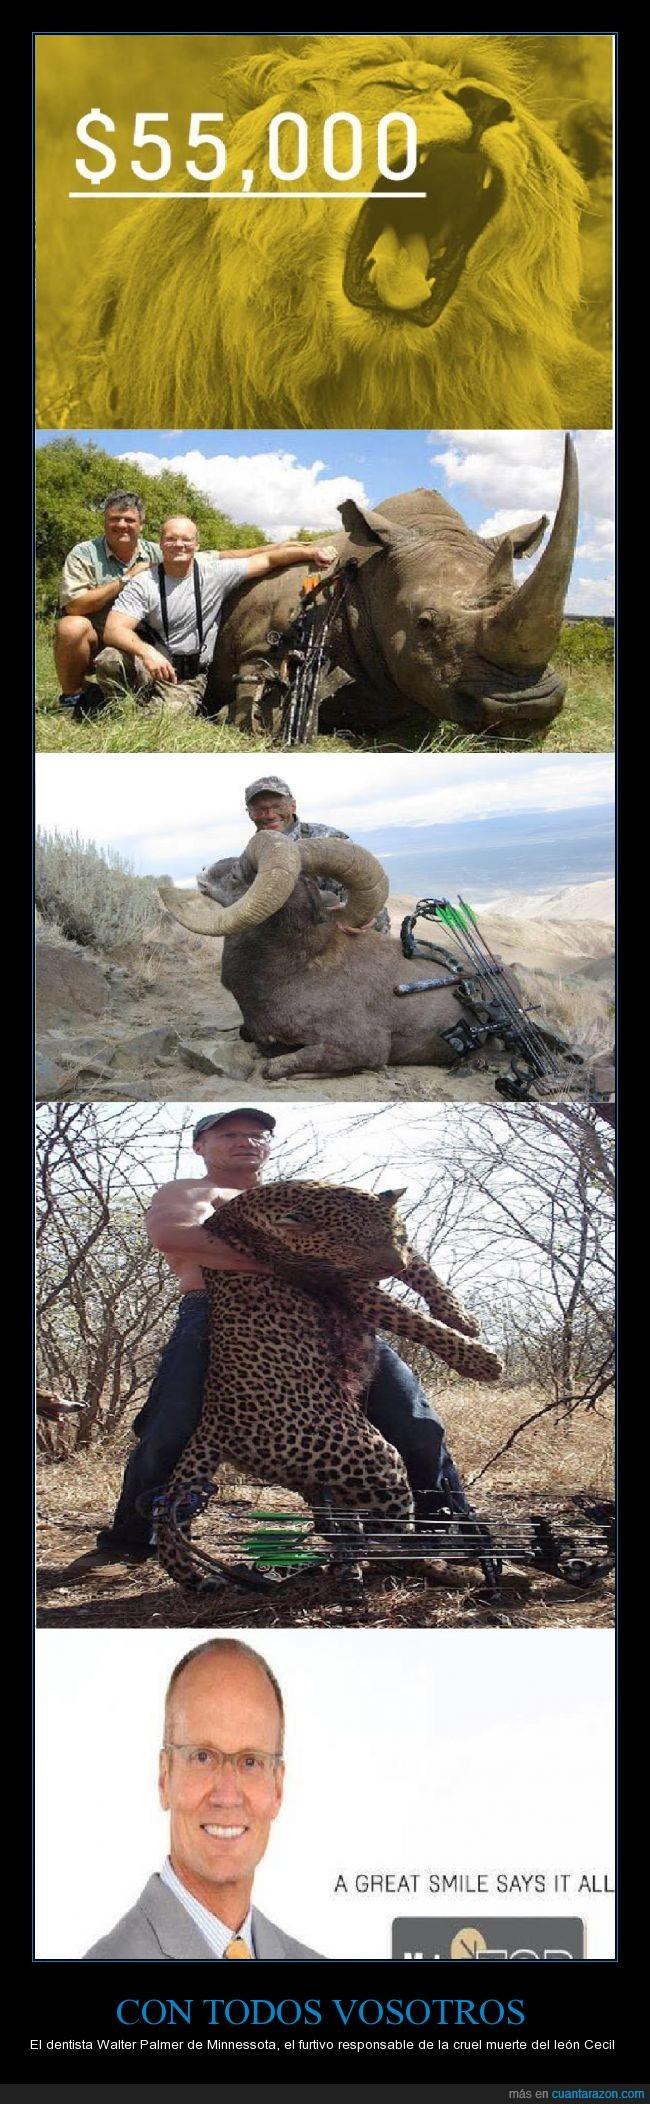 caza,cecil,dentista,furtivo,león,Walter Palmer,zimbawe